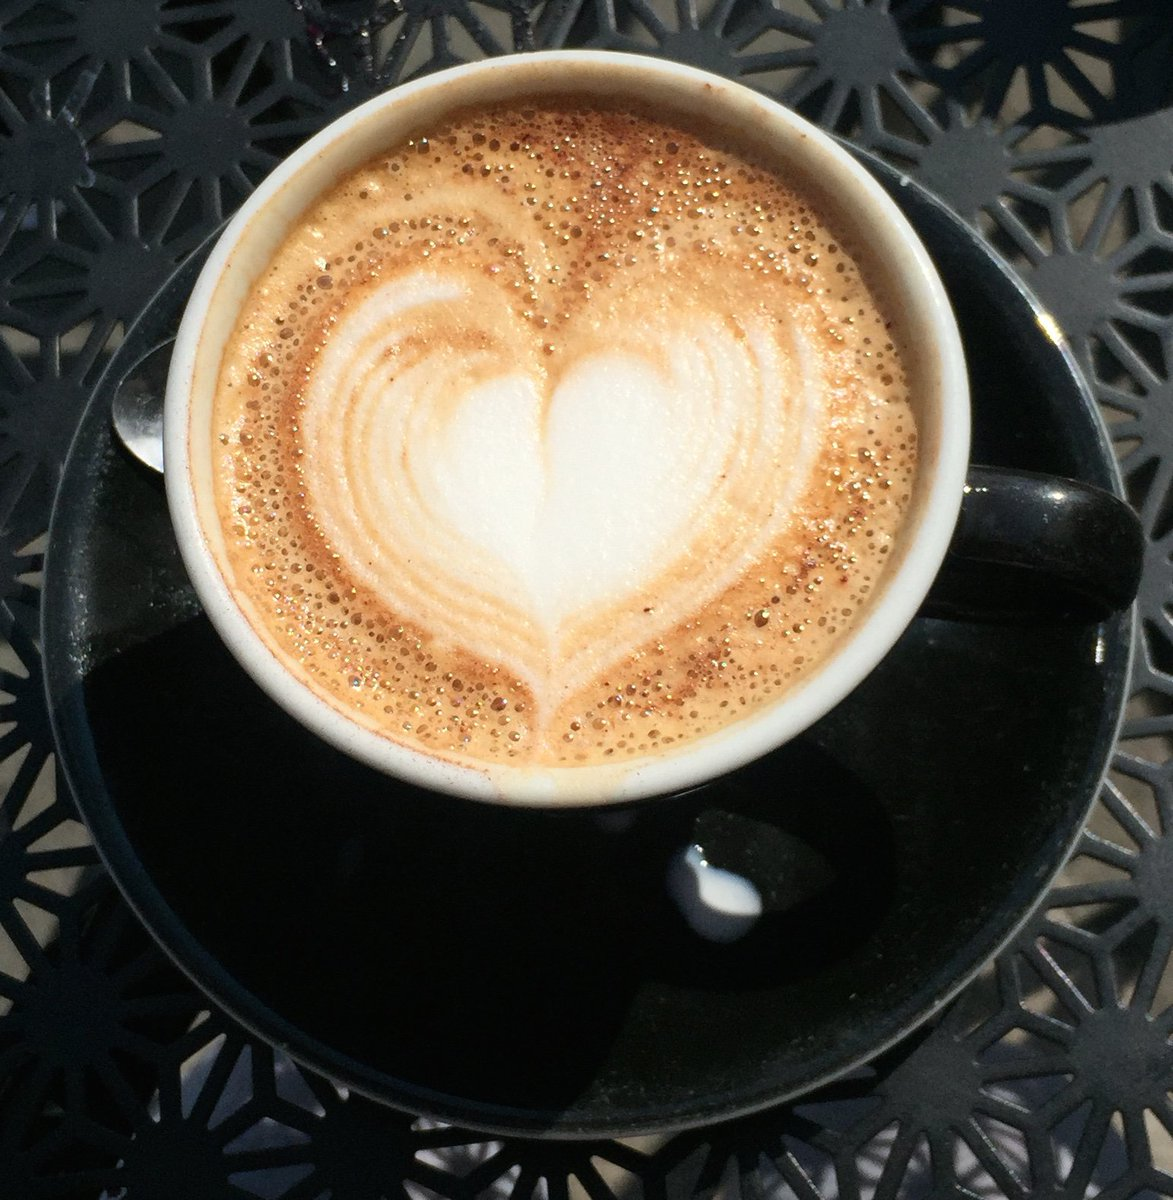 RT @edinburgh: Celebrate UKCoffeeWeek by visiting the best caffeine hotspots in Edinburgh >